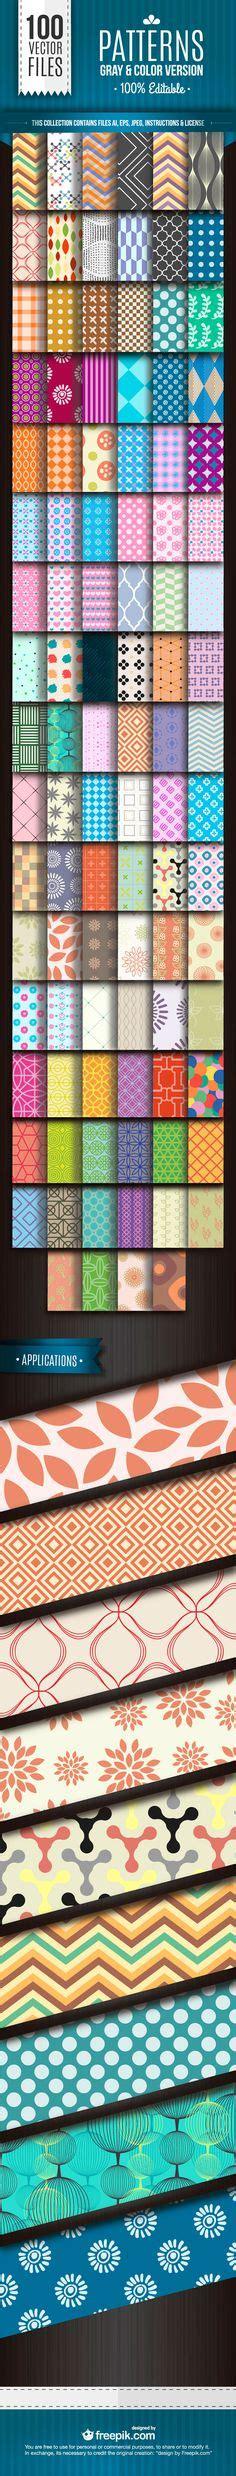 svg pattern sle indigo watercolour patterns pack indigo creative and